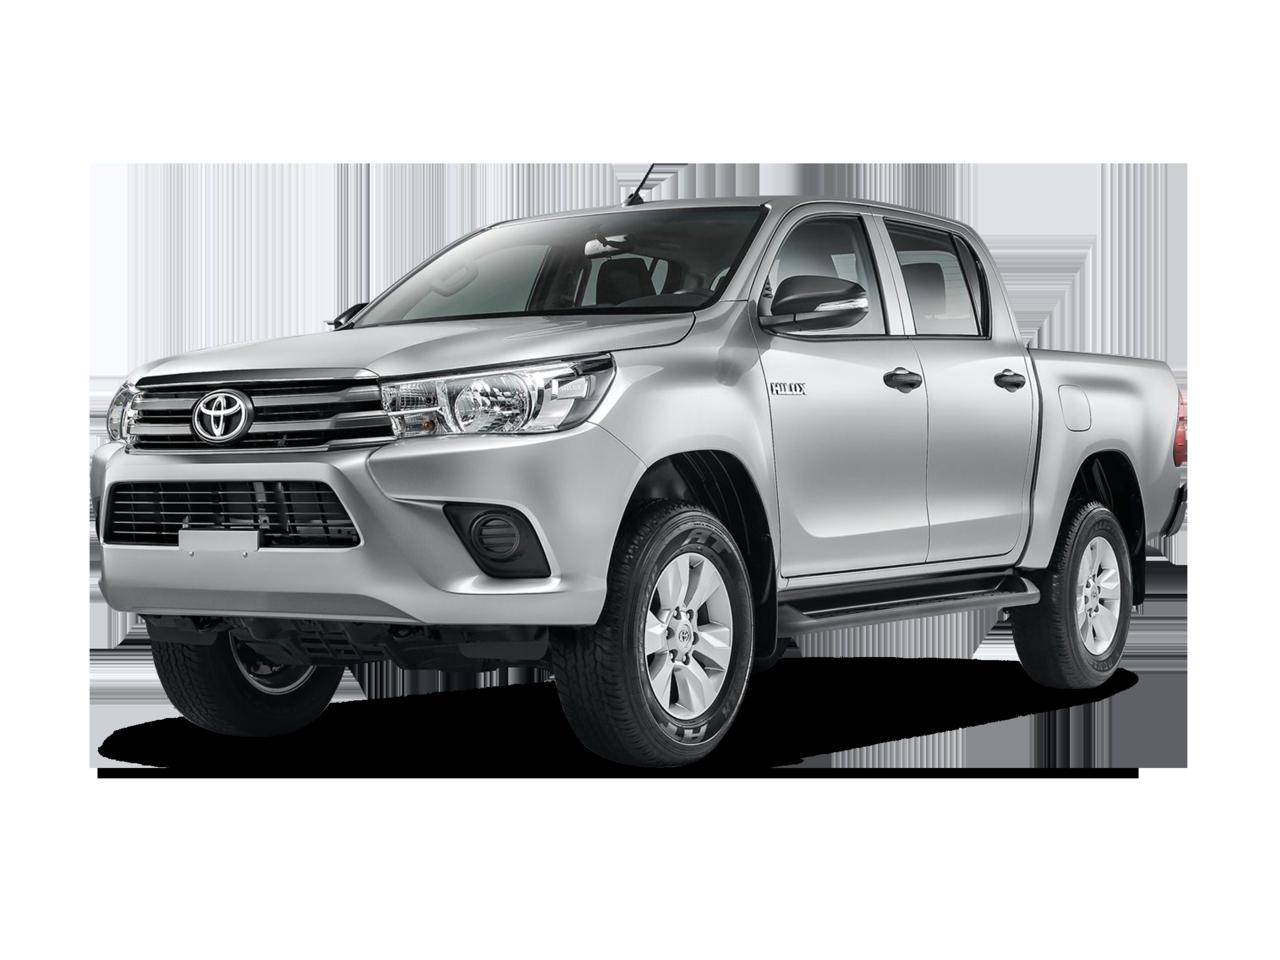 Kelebihan Toyota Hilux 2017 Perbandingan Harga